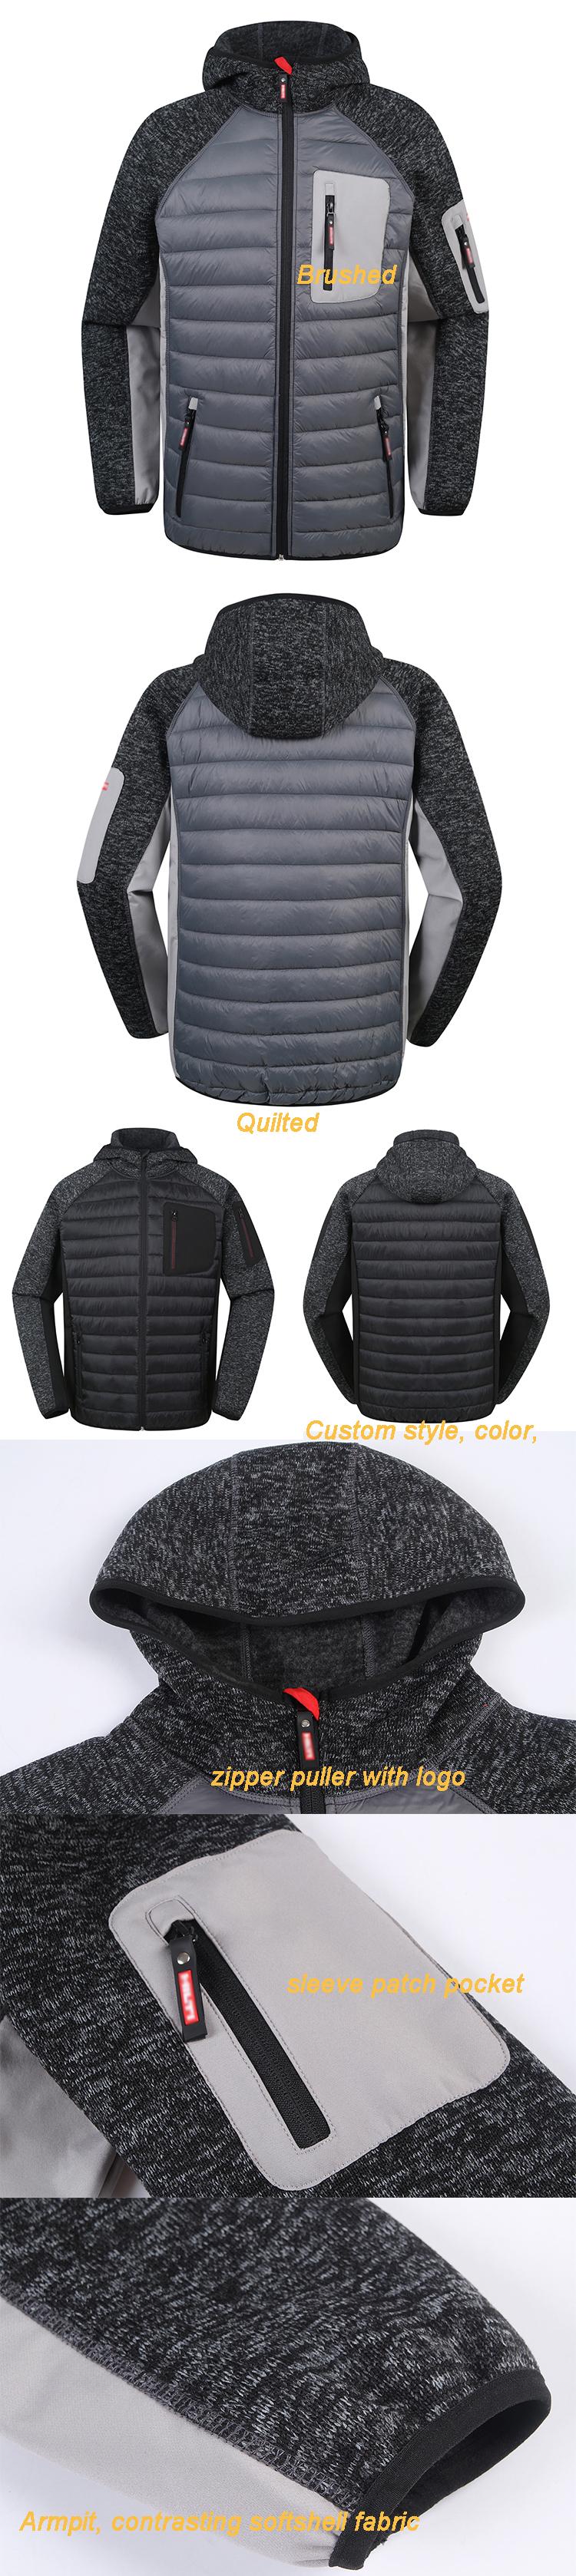 custom mens cotton fleece Outdoor warm light weight sport exercise waterproof winter quilted padded jacket